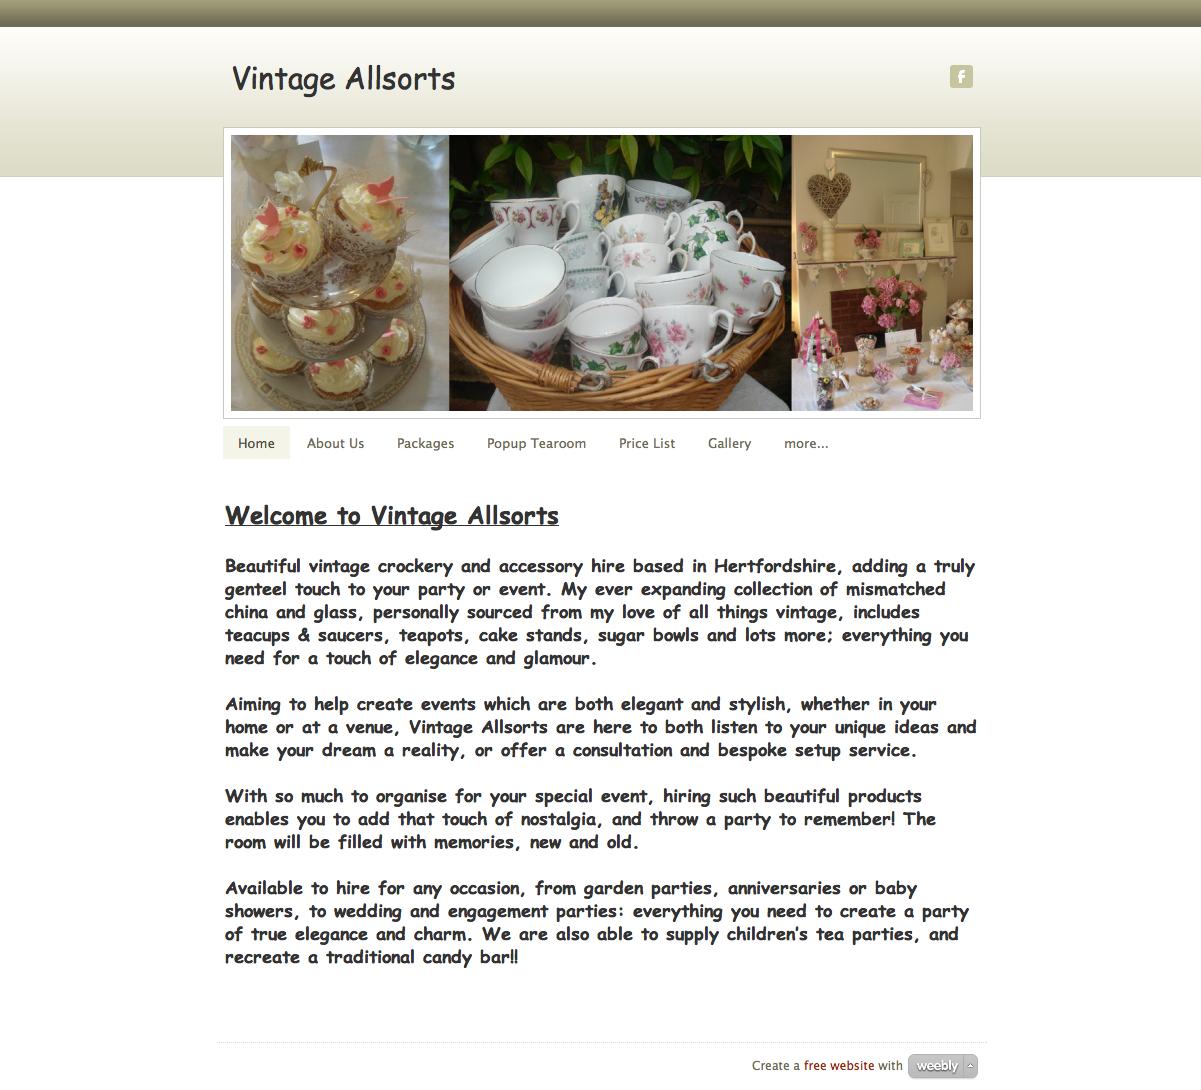 Vintage Allsorts